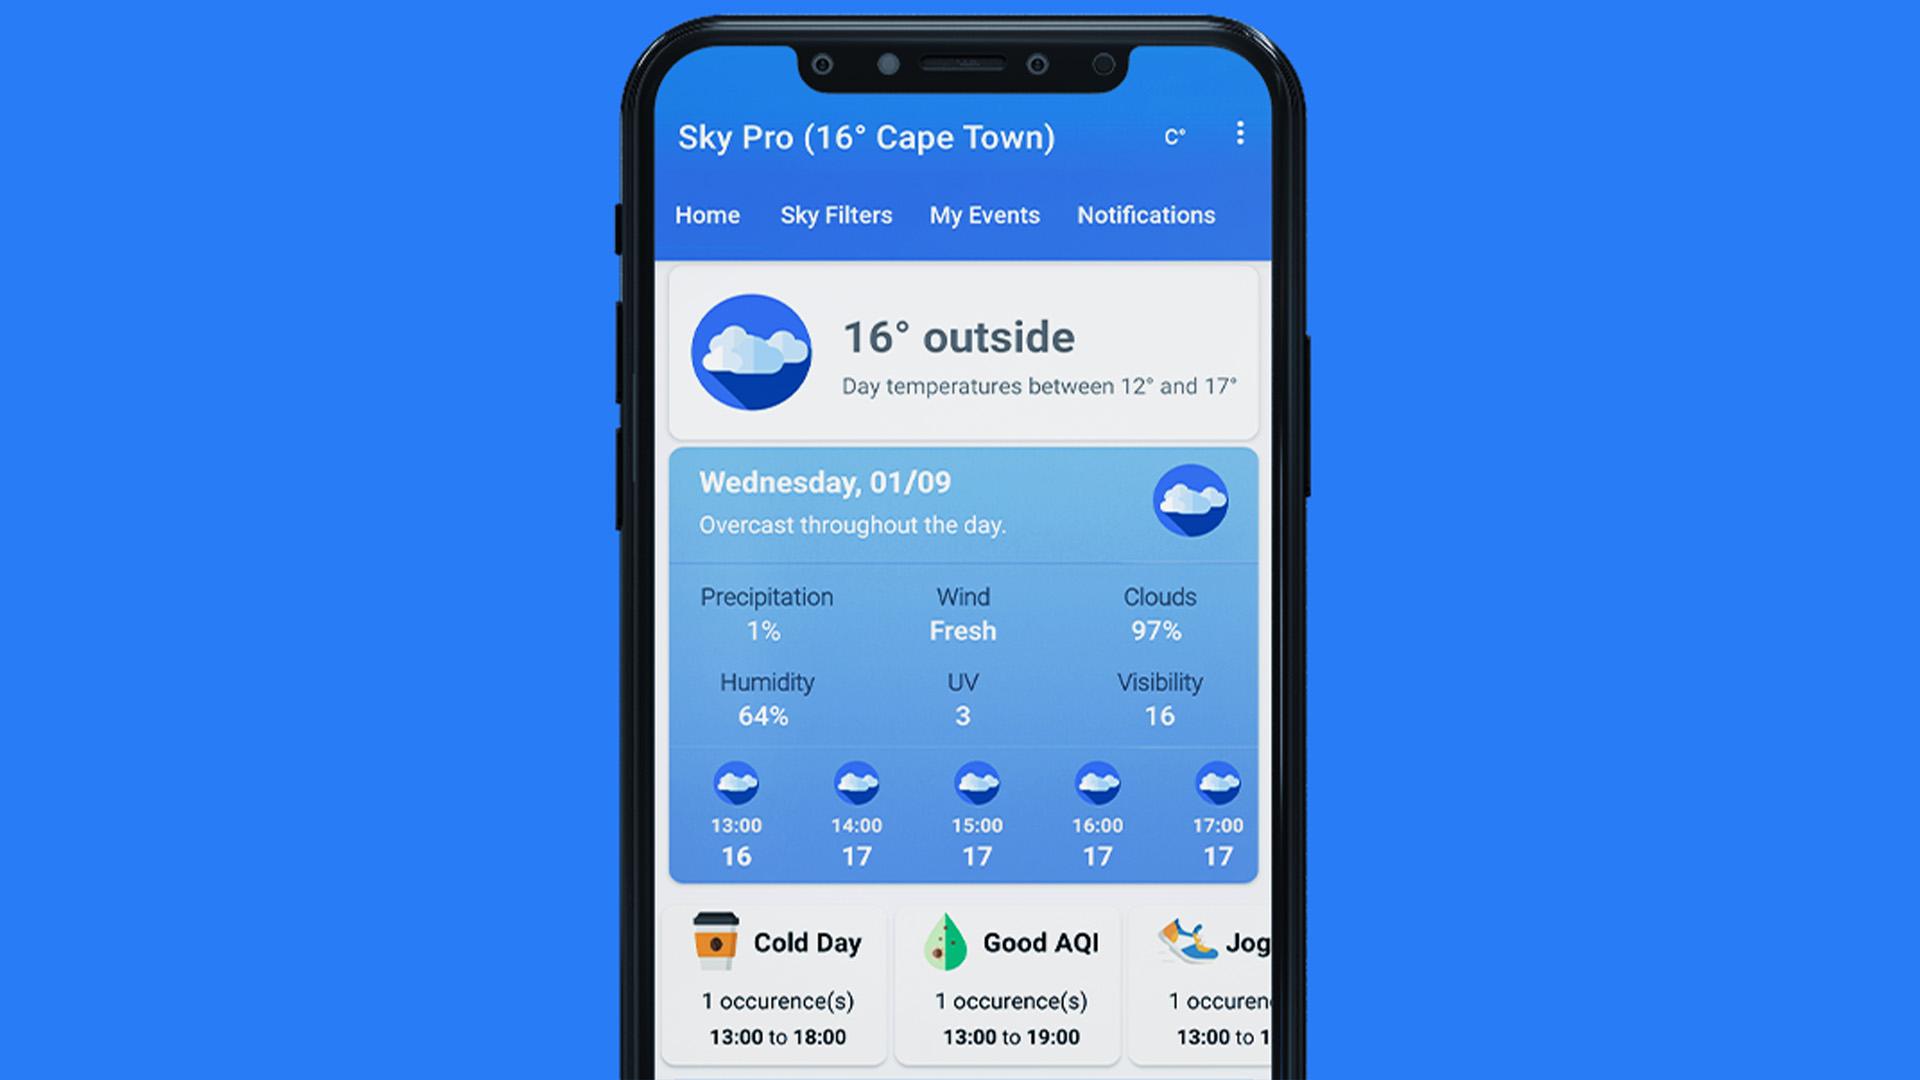 Android Apps Weekly - Sky Weatherman screenshot